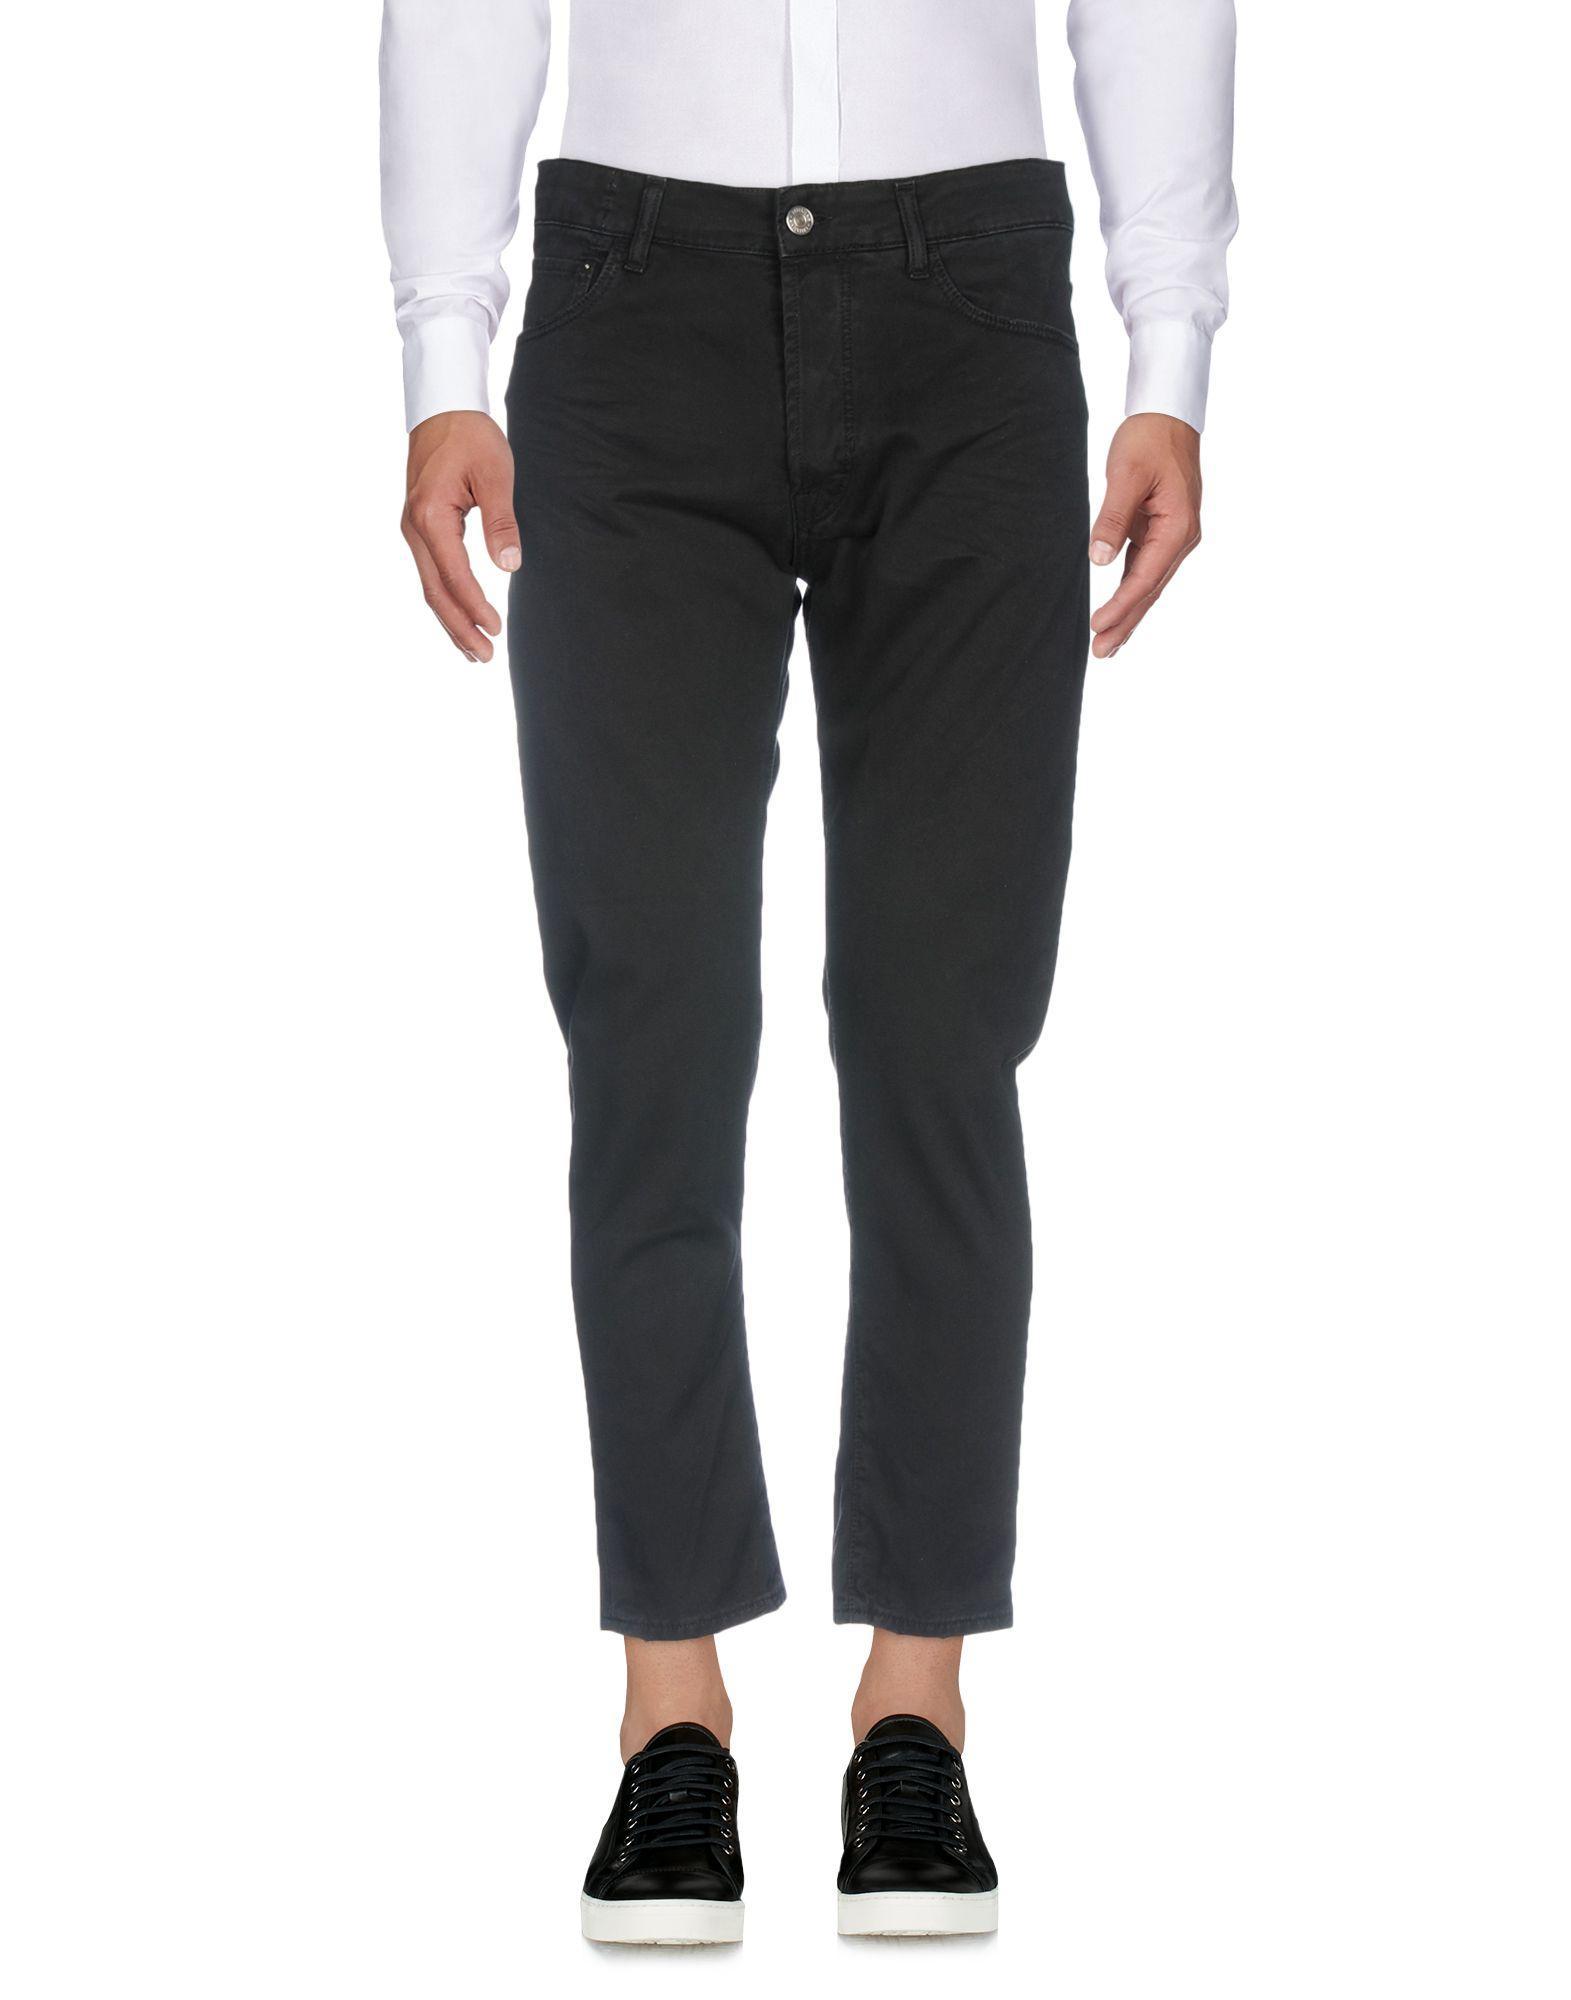 Low Brand 5-pocket In Black